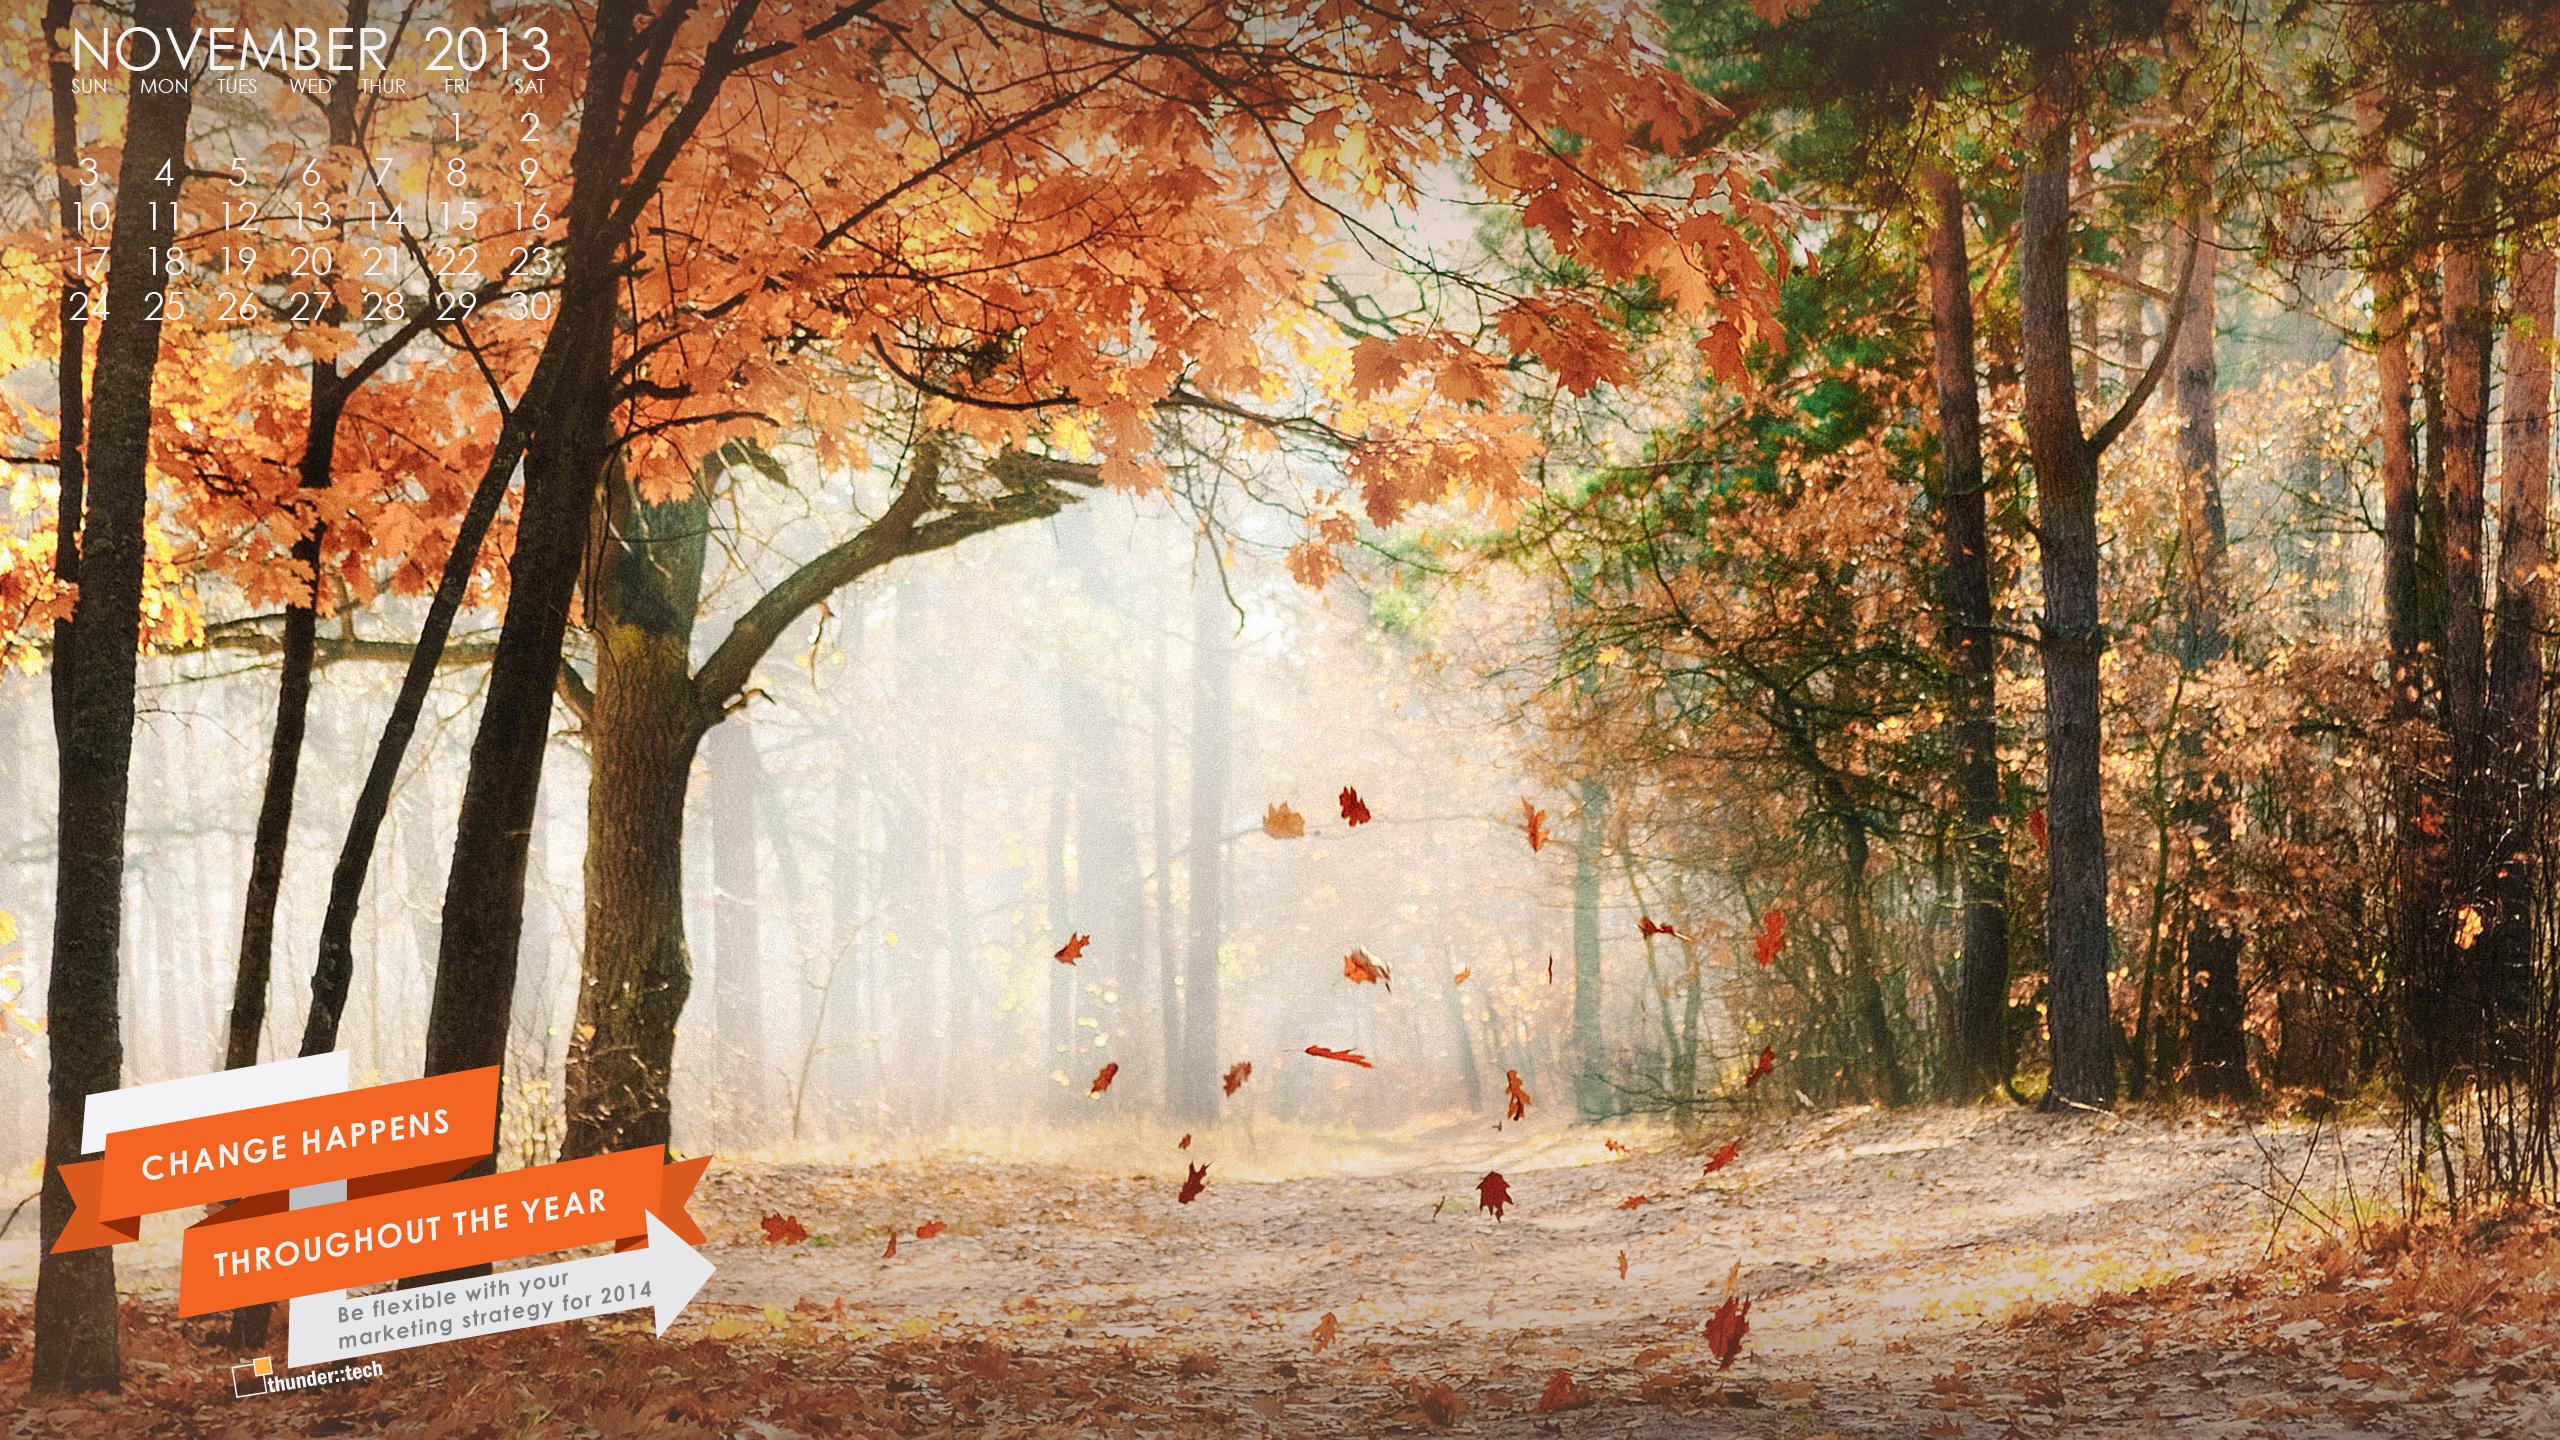 Leaves Fall Desktop Wallpaper Our November Wallpaper Brings A Change Of Autumn Scenery